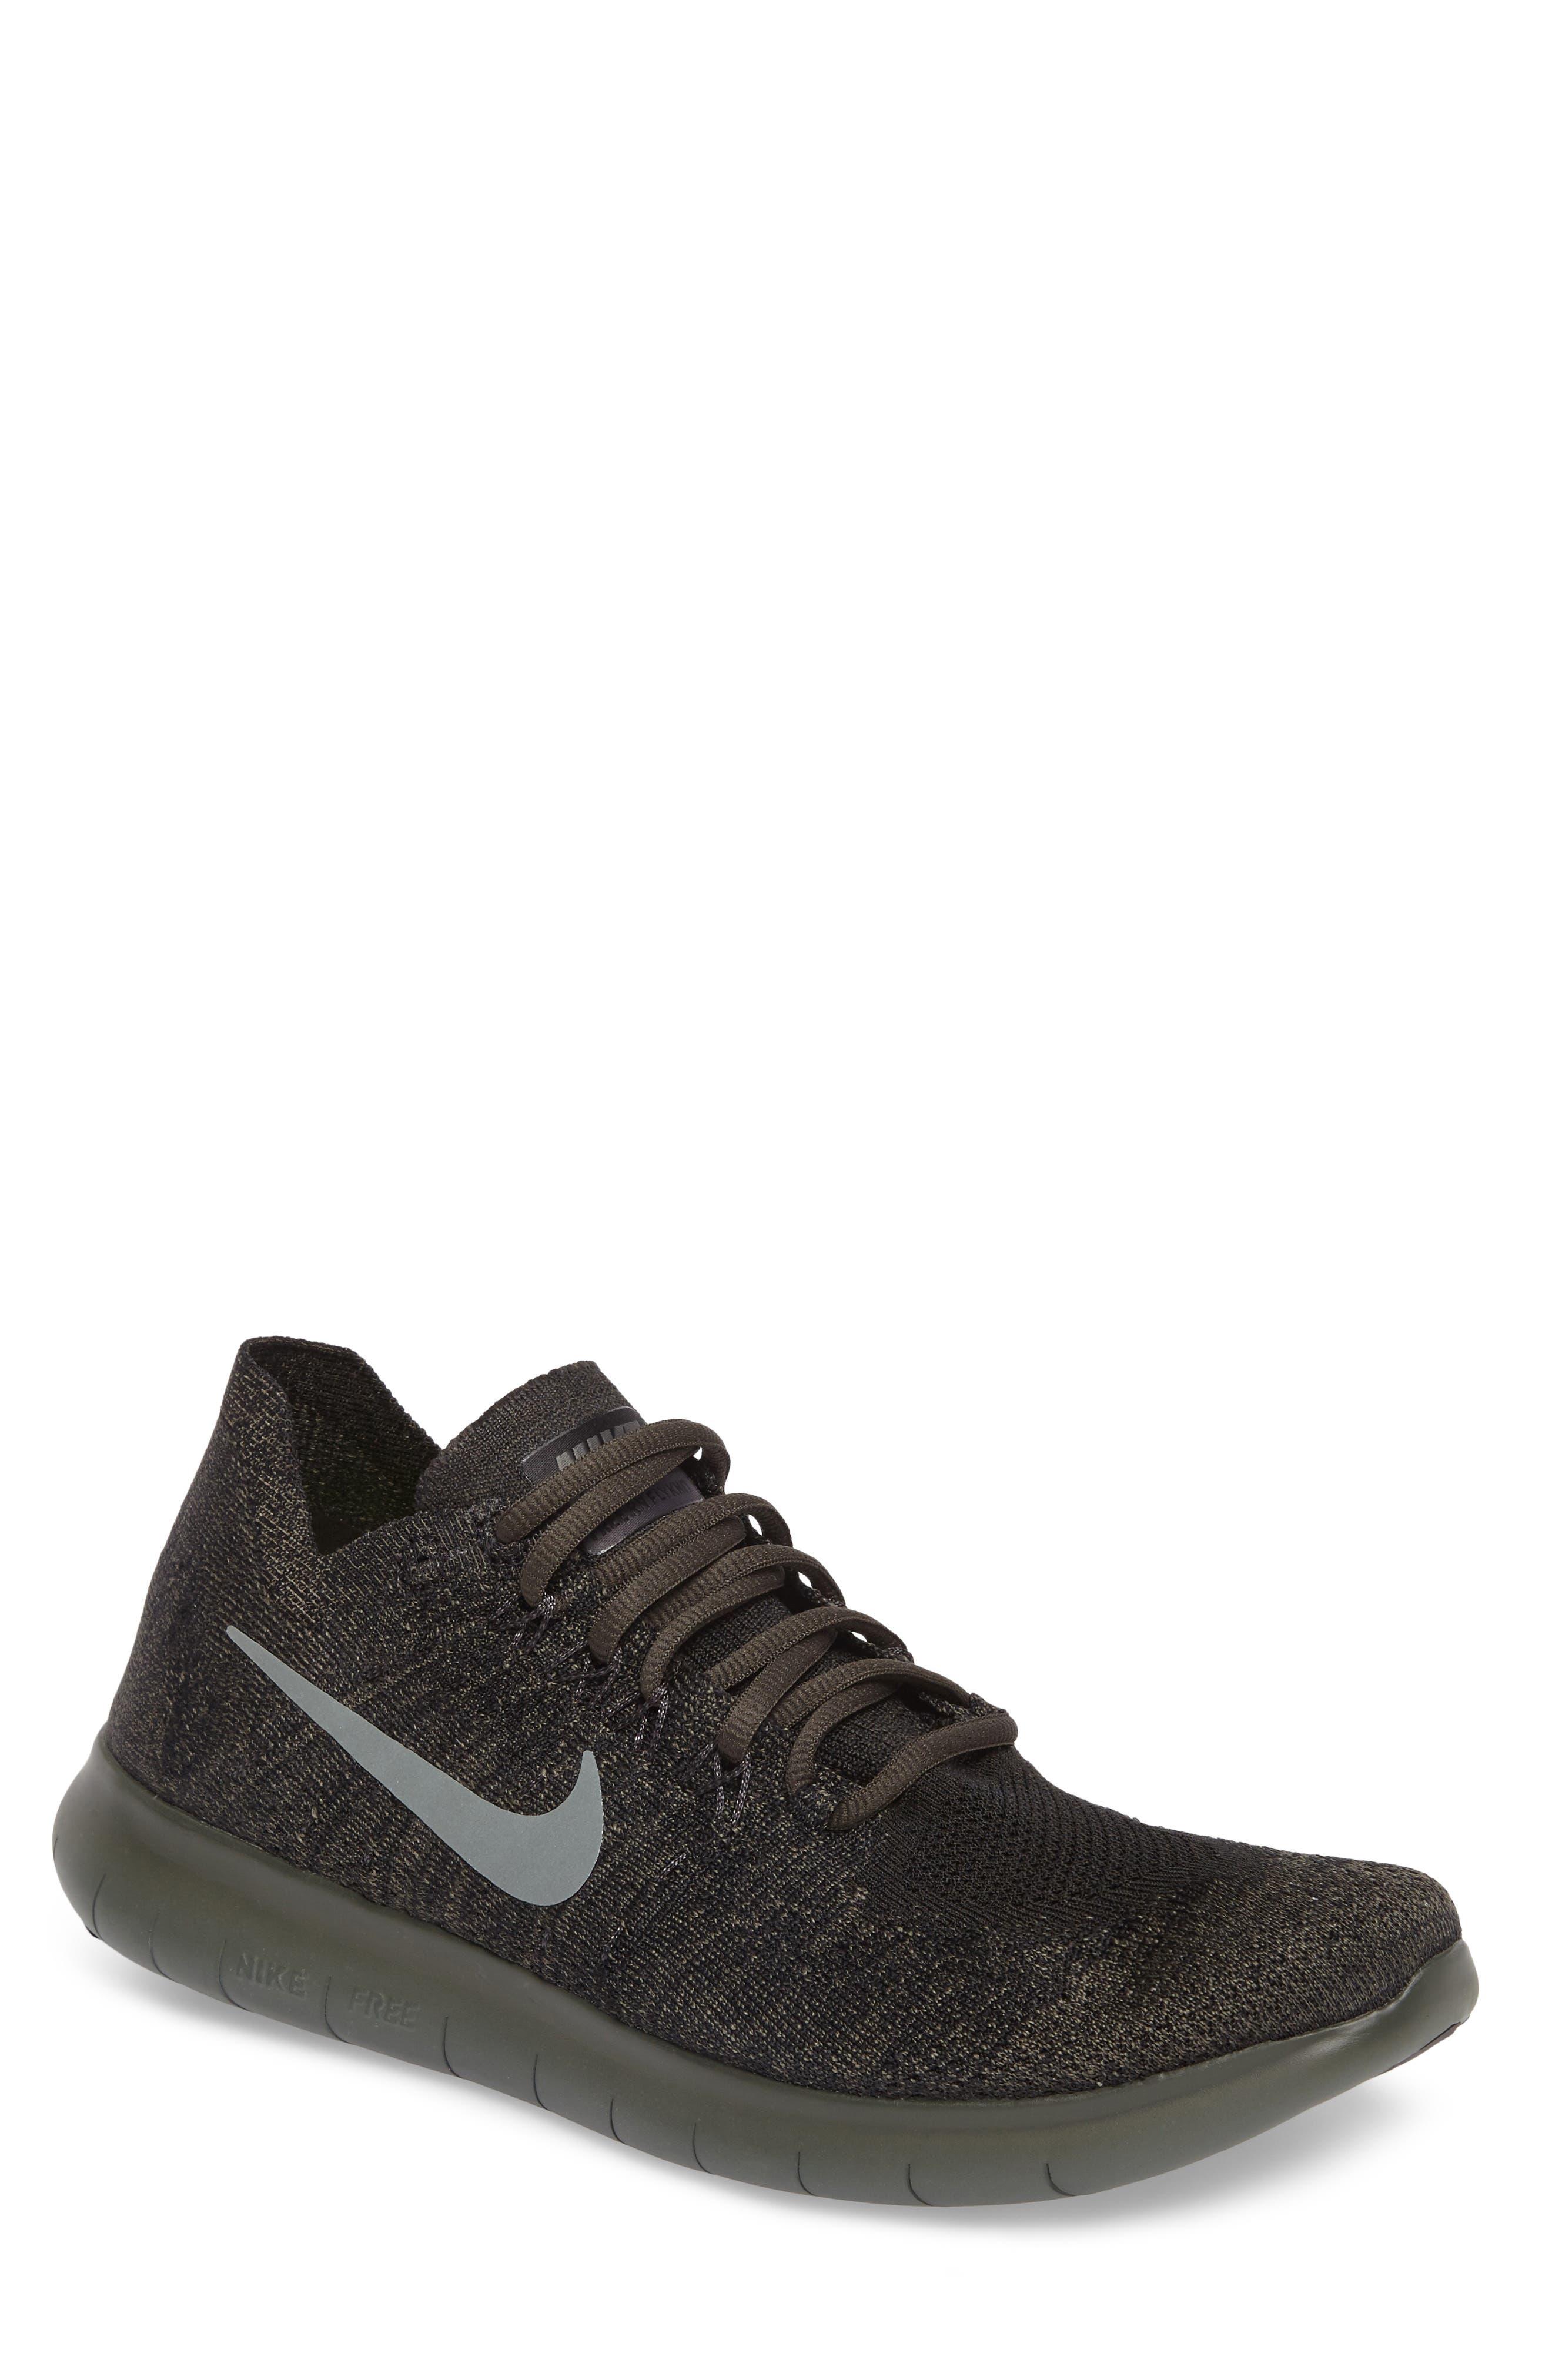 Nike Free Run Flyknit 2017 Running Shoe (Men)